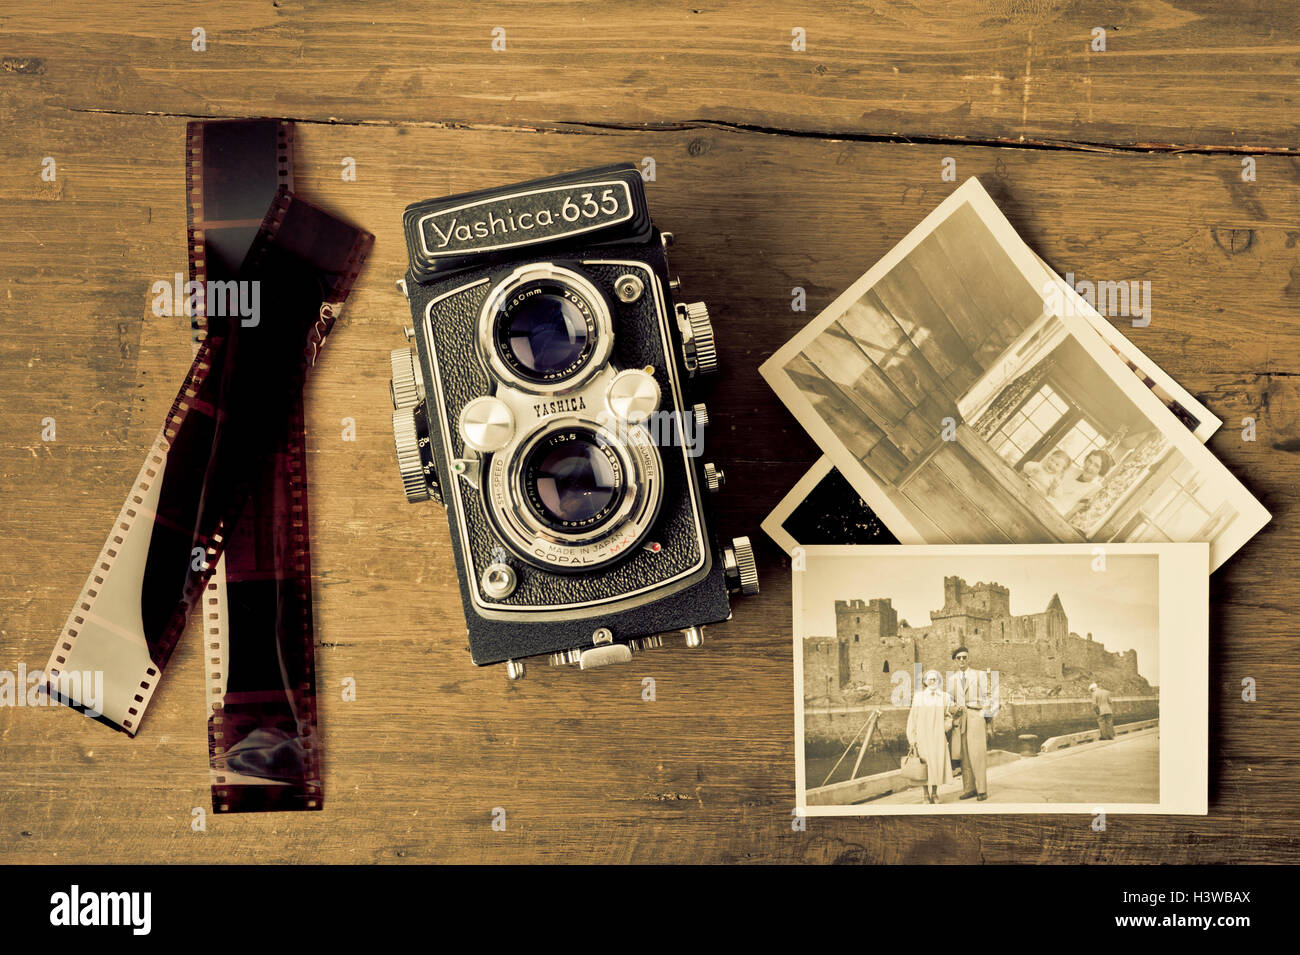 Vintage Yashica Kamera und Fotos Stockbild